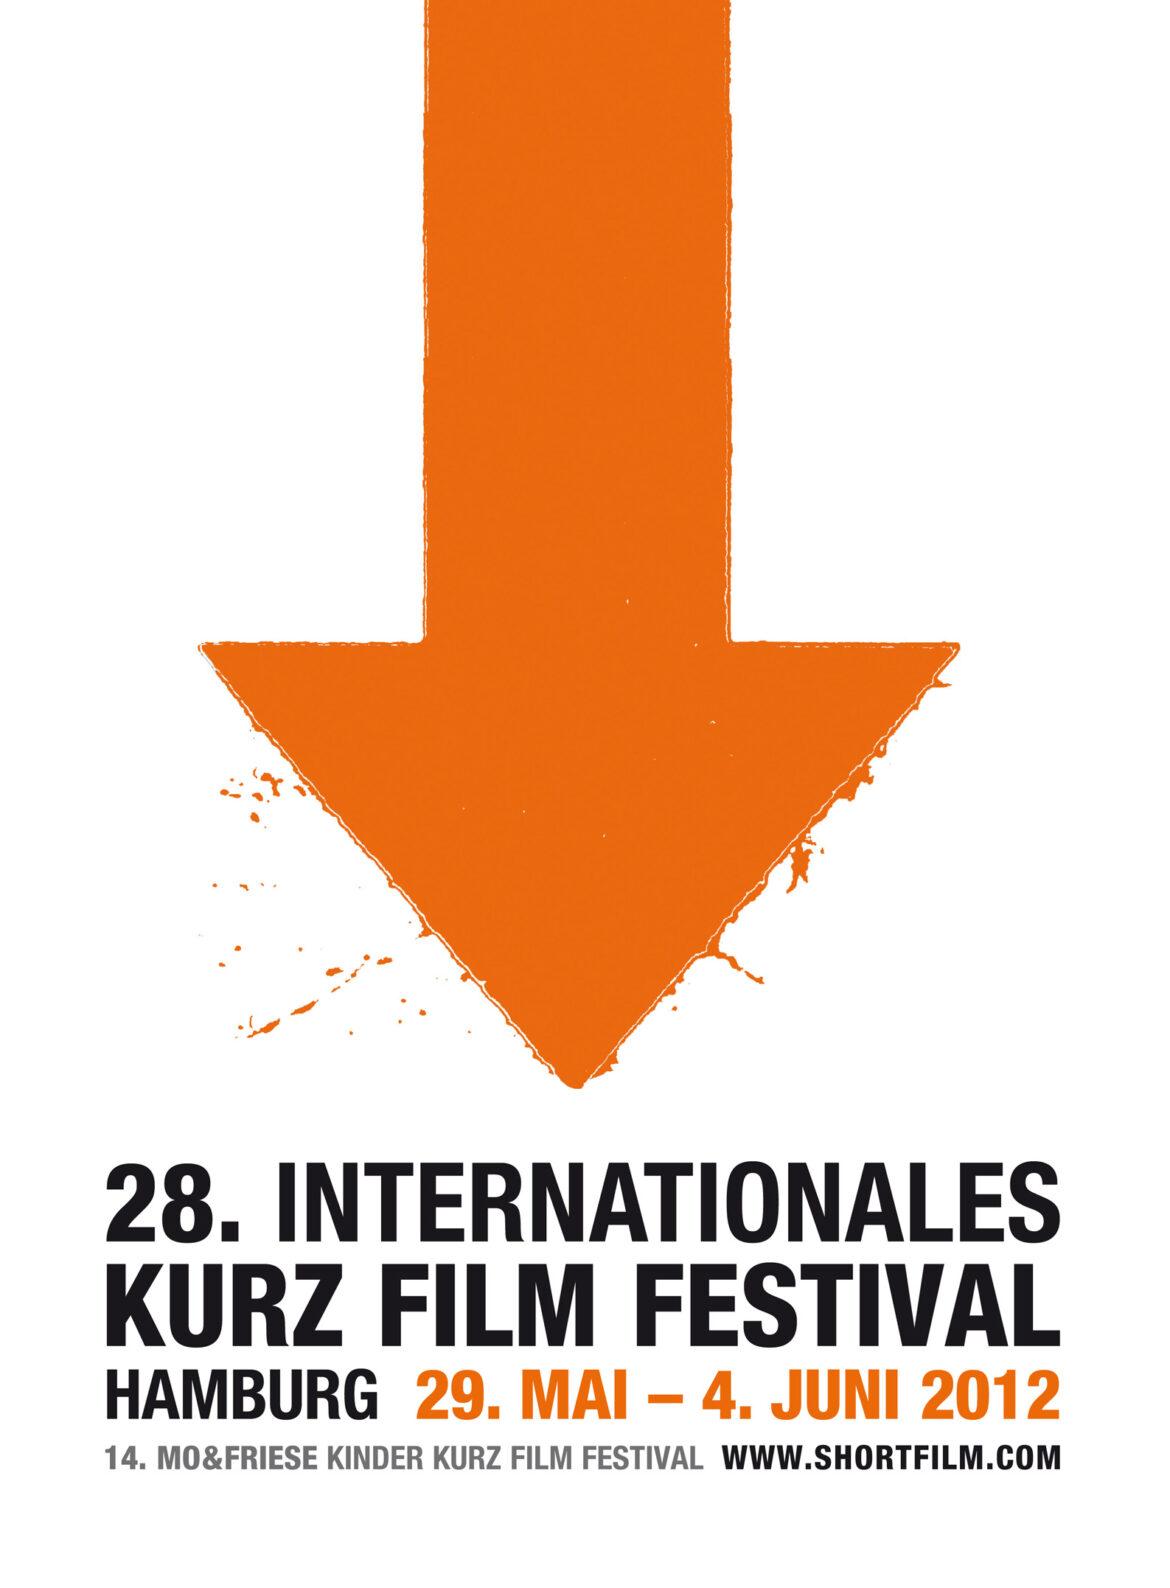 Mai & Juni 2012 Film: 28. Internationales KurzFilmFestival Hamburg